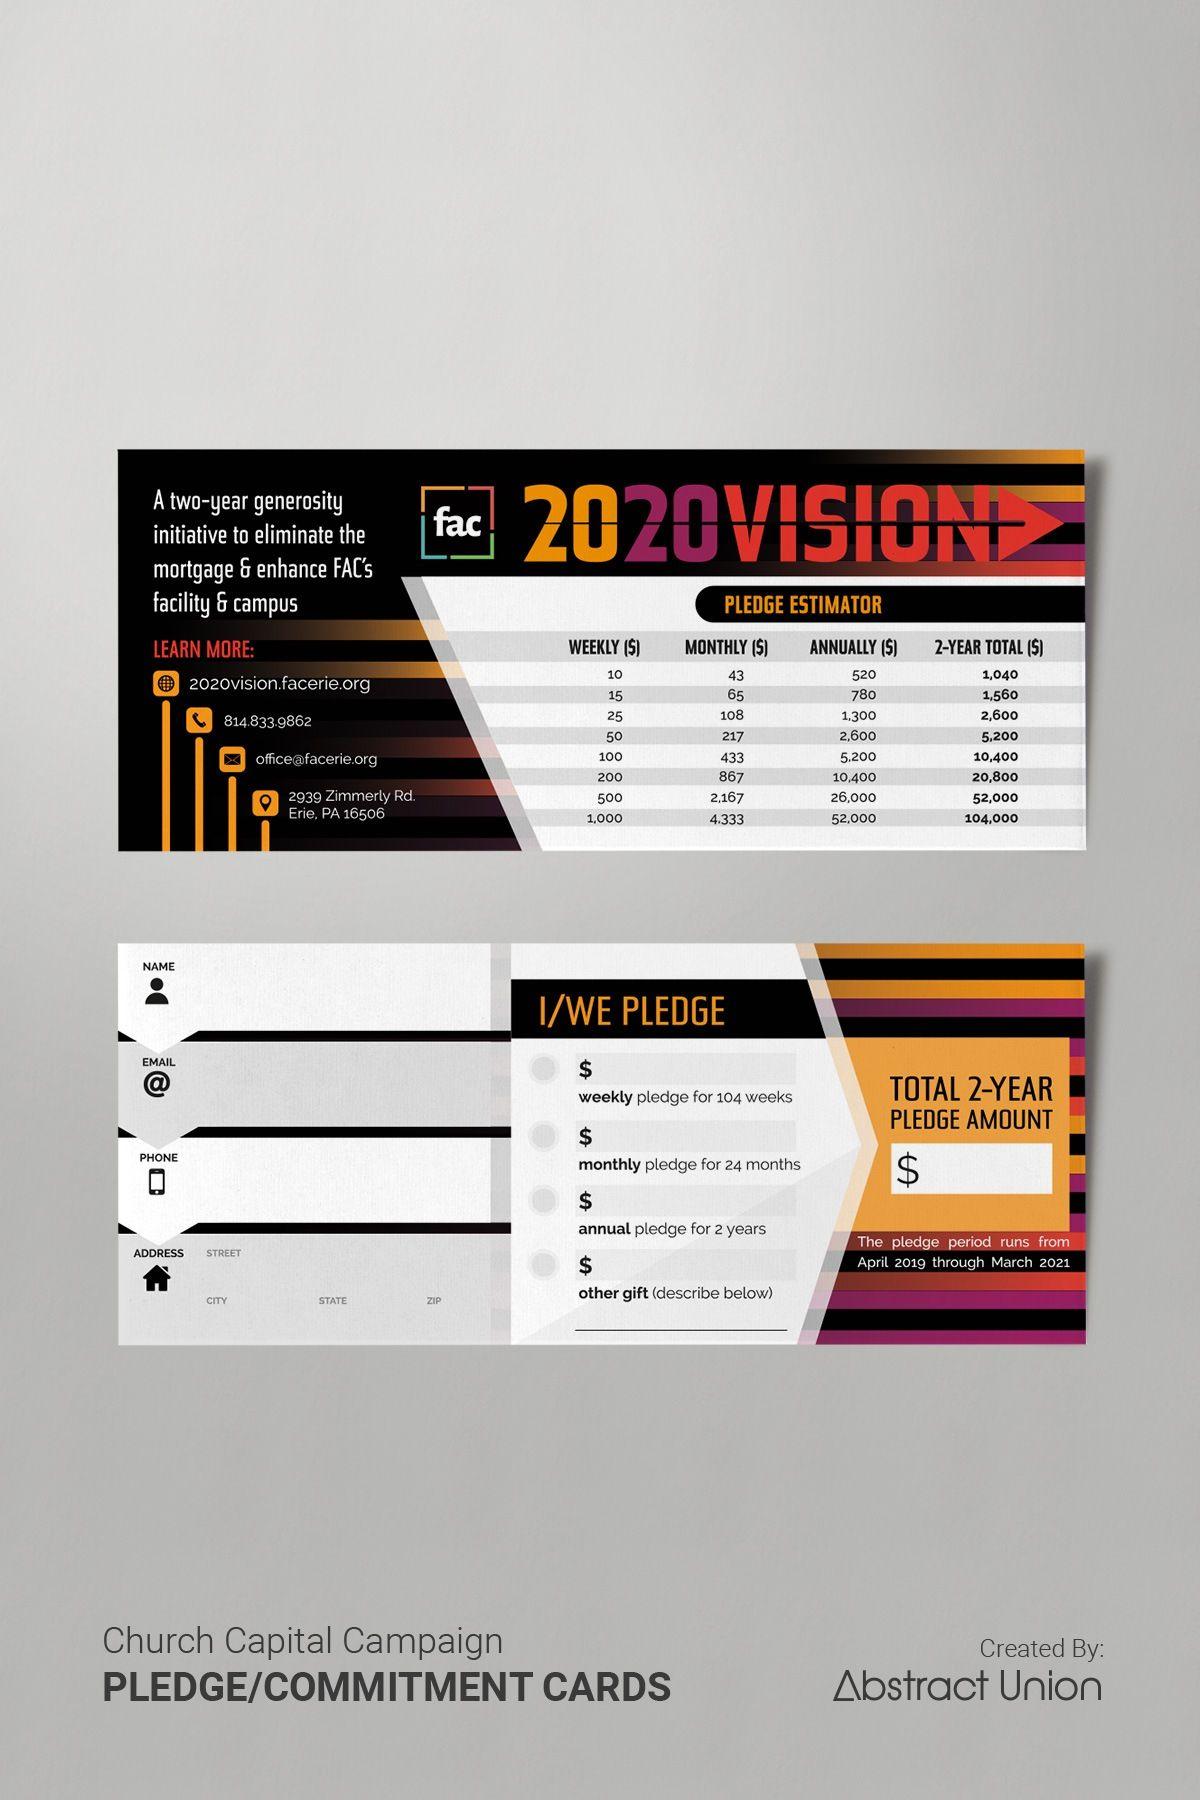 3 5 X 8 5 Pledge Commitment Cards Design Fundraising Cards Church Capital Campaign Pledge